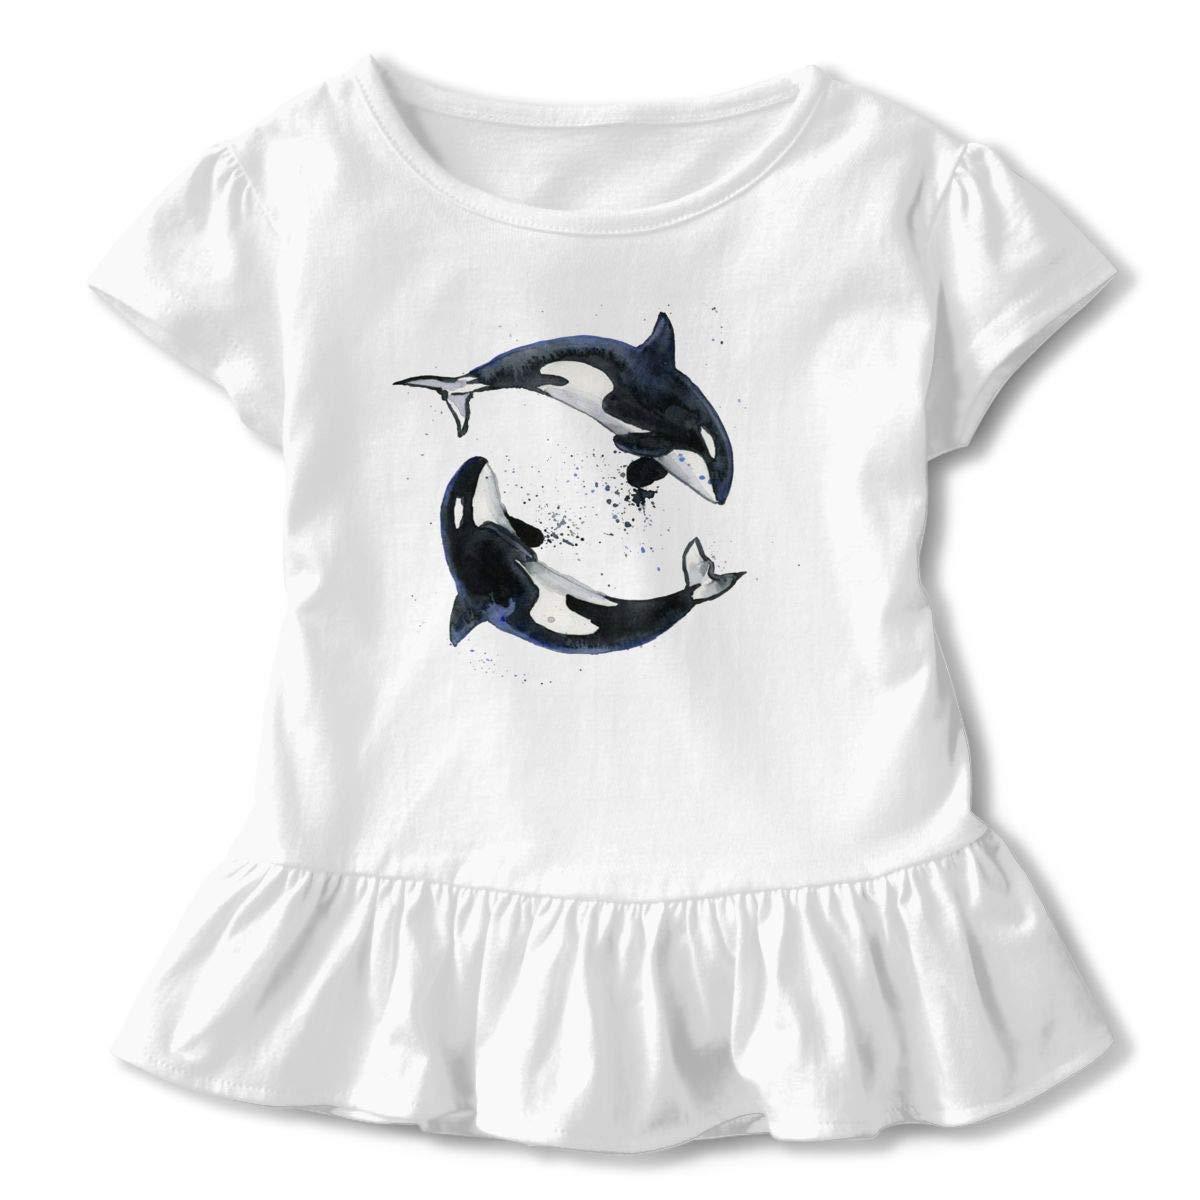 Clarissa Bertha Splashing Pattern Orca Whale Toddler Baby Girls Short Sleeve Ruffle T-Shirt